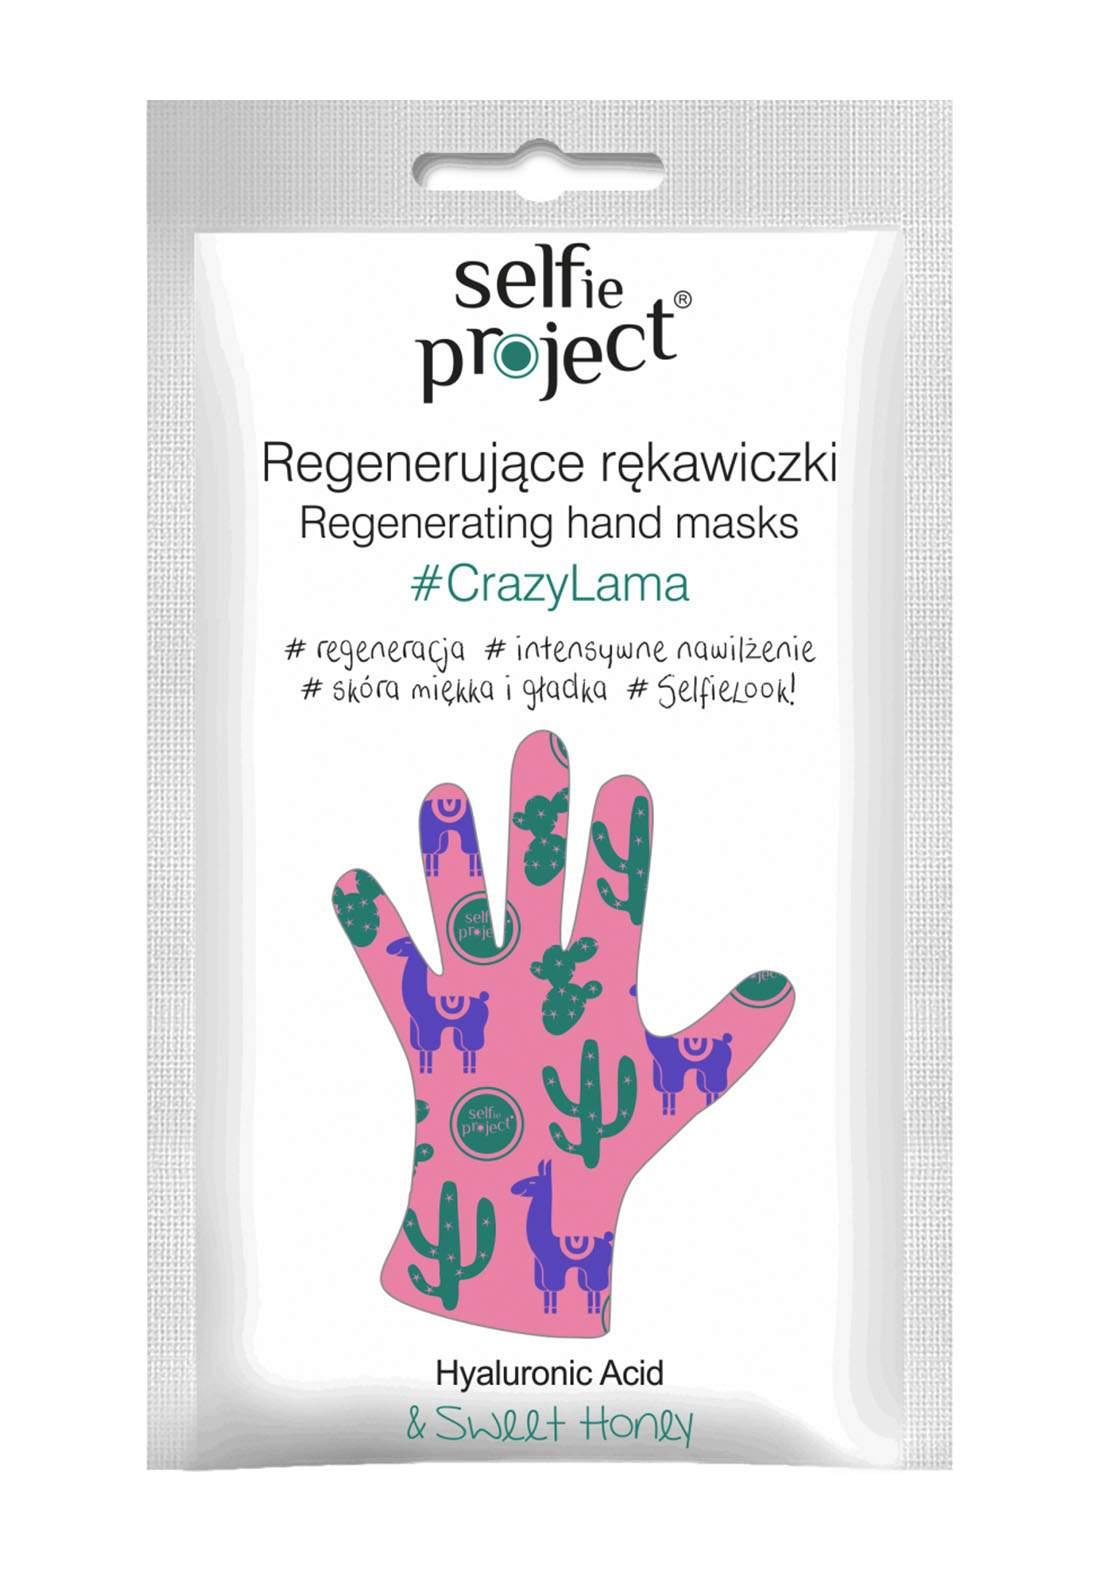 Selfie Project Crazy Lama Hand Mask ماسك كفوف عناية و نعومة اليدين